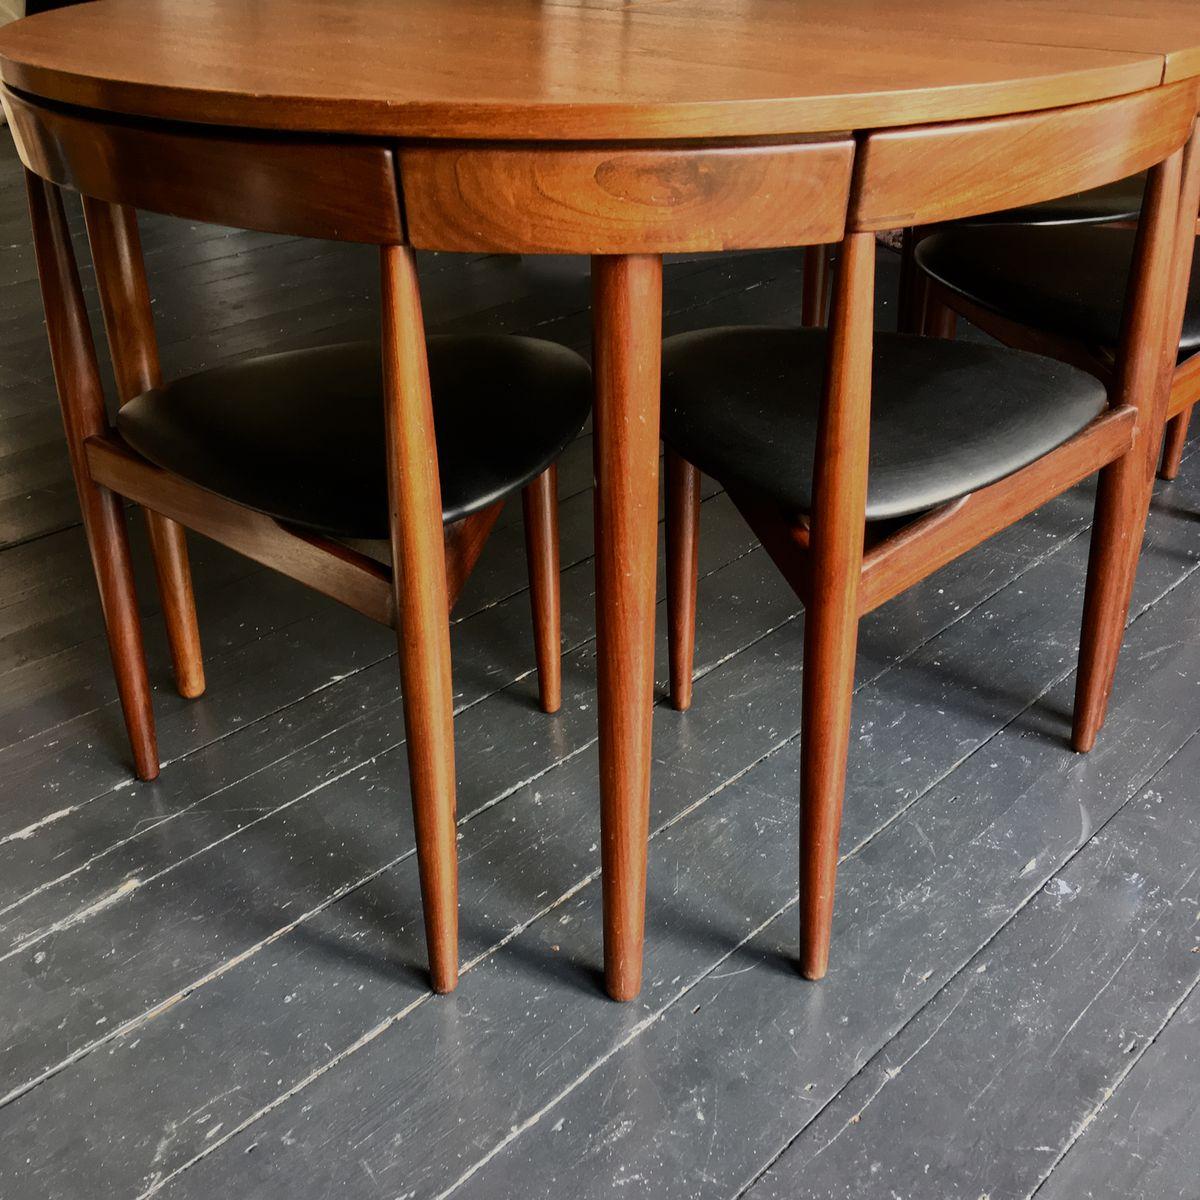 Danish Dining Room Set: Danish Roundette Dining Room Set By Hans Olsen For Frem